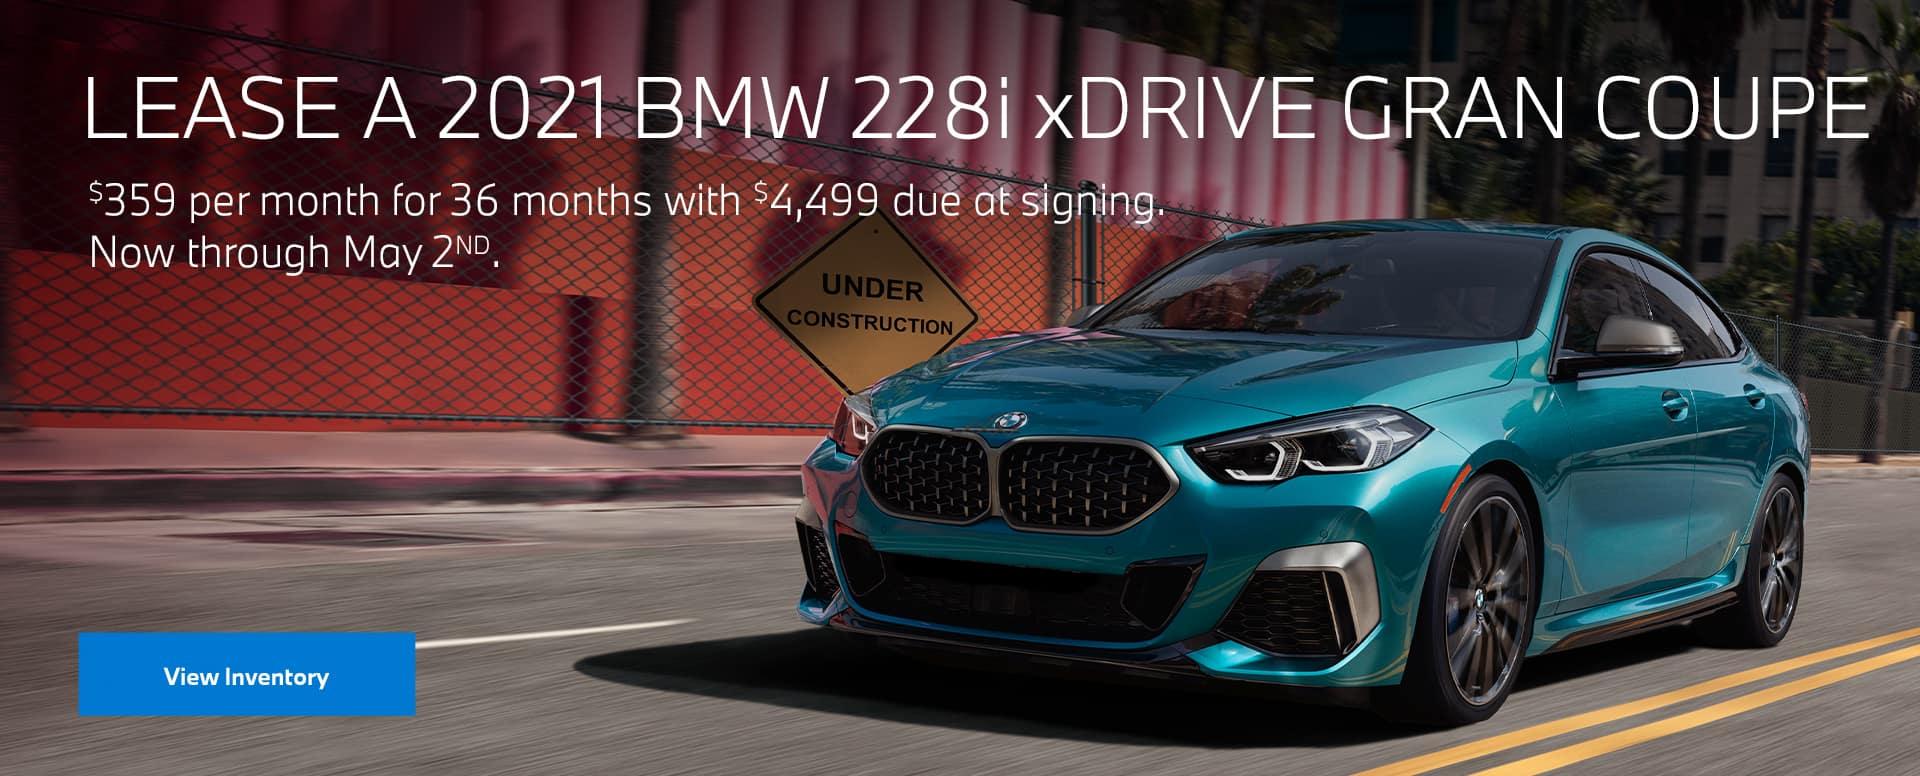 2021 BMW 228i xDrive